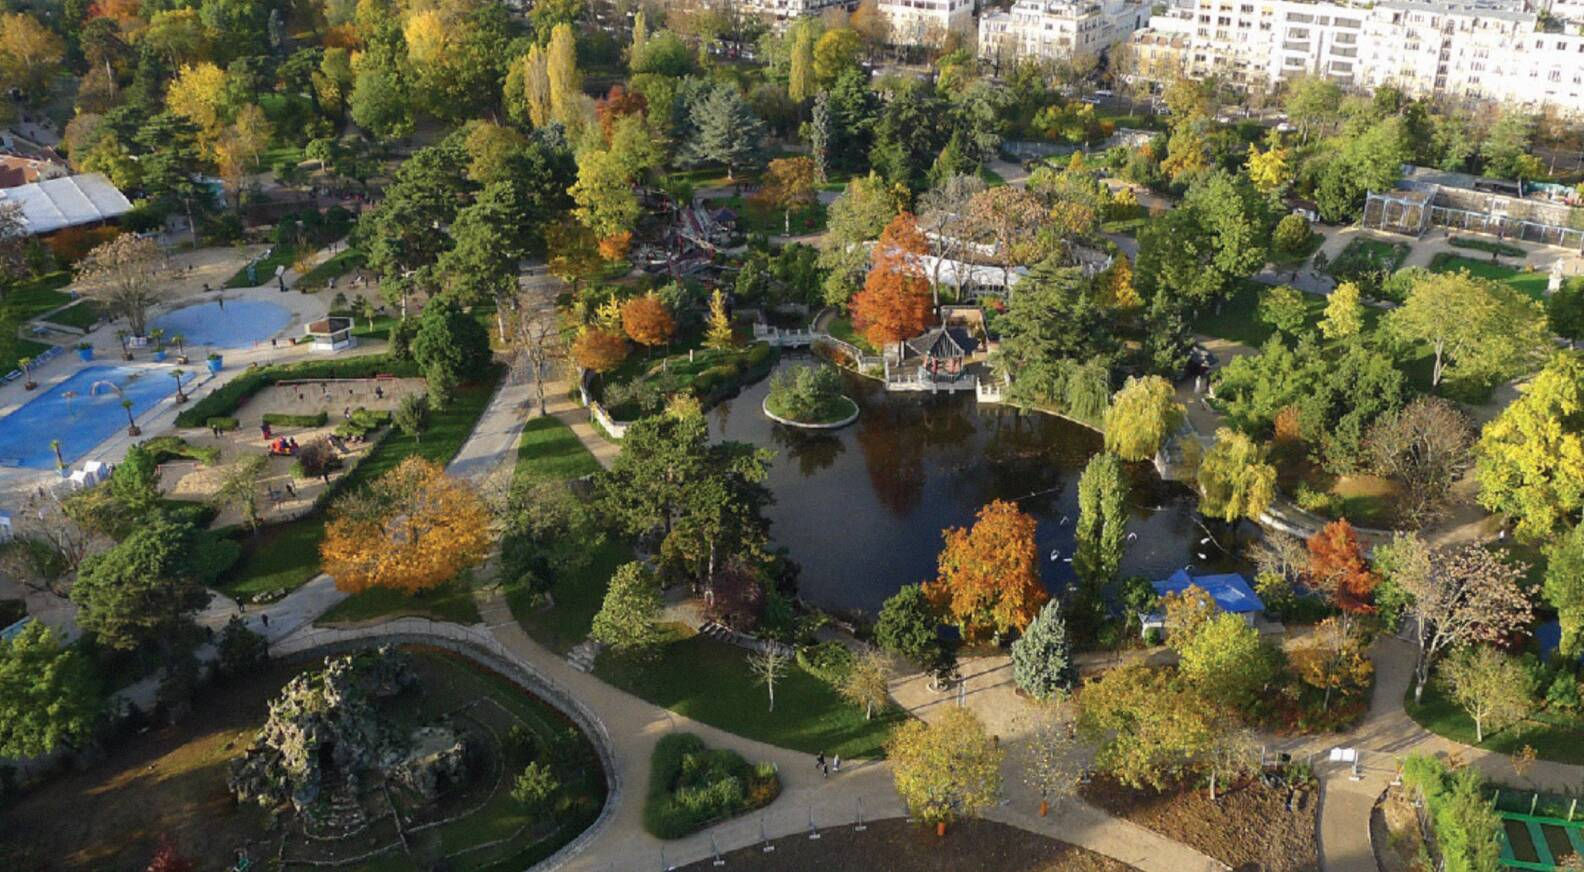 Jardin D Acclimatation Gets A Makeover For Spring 2018 Lvmh